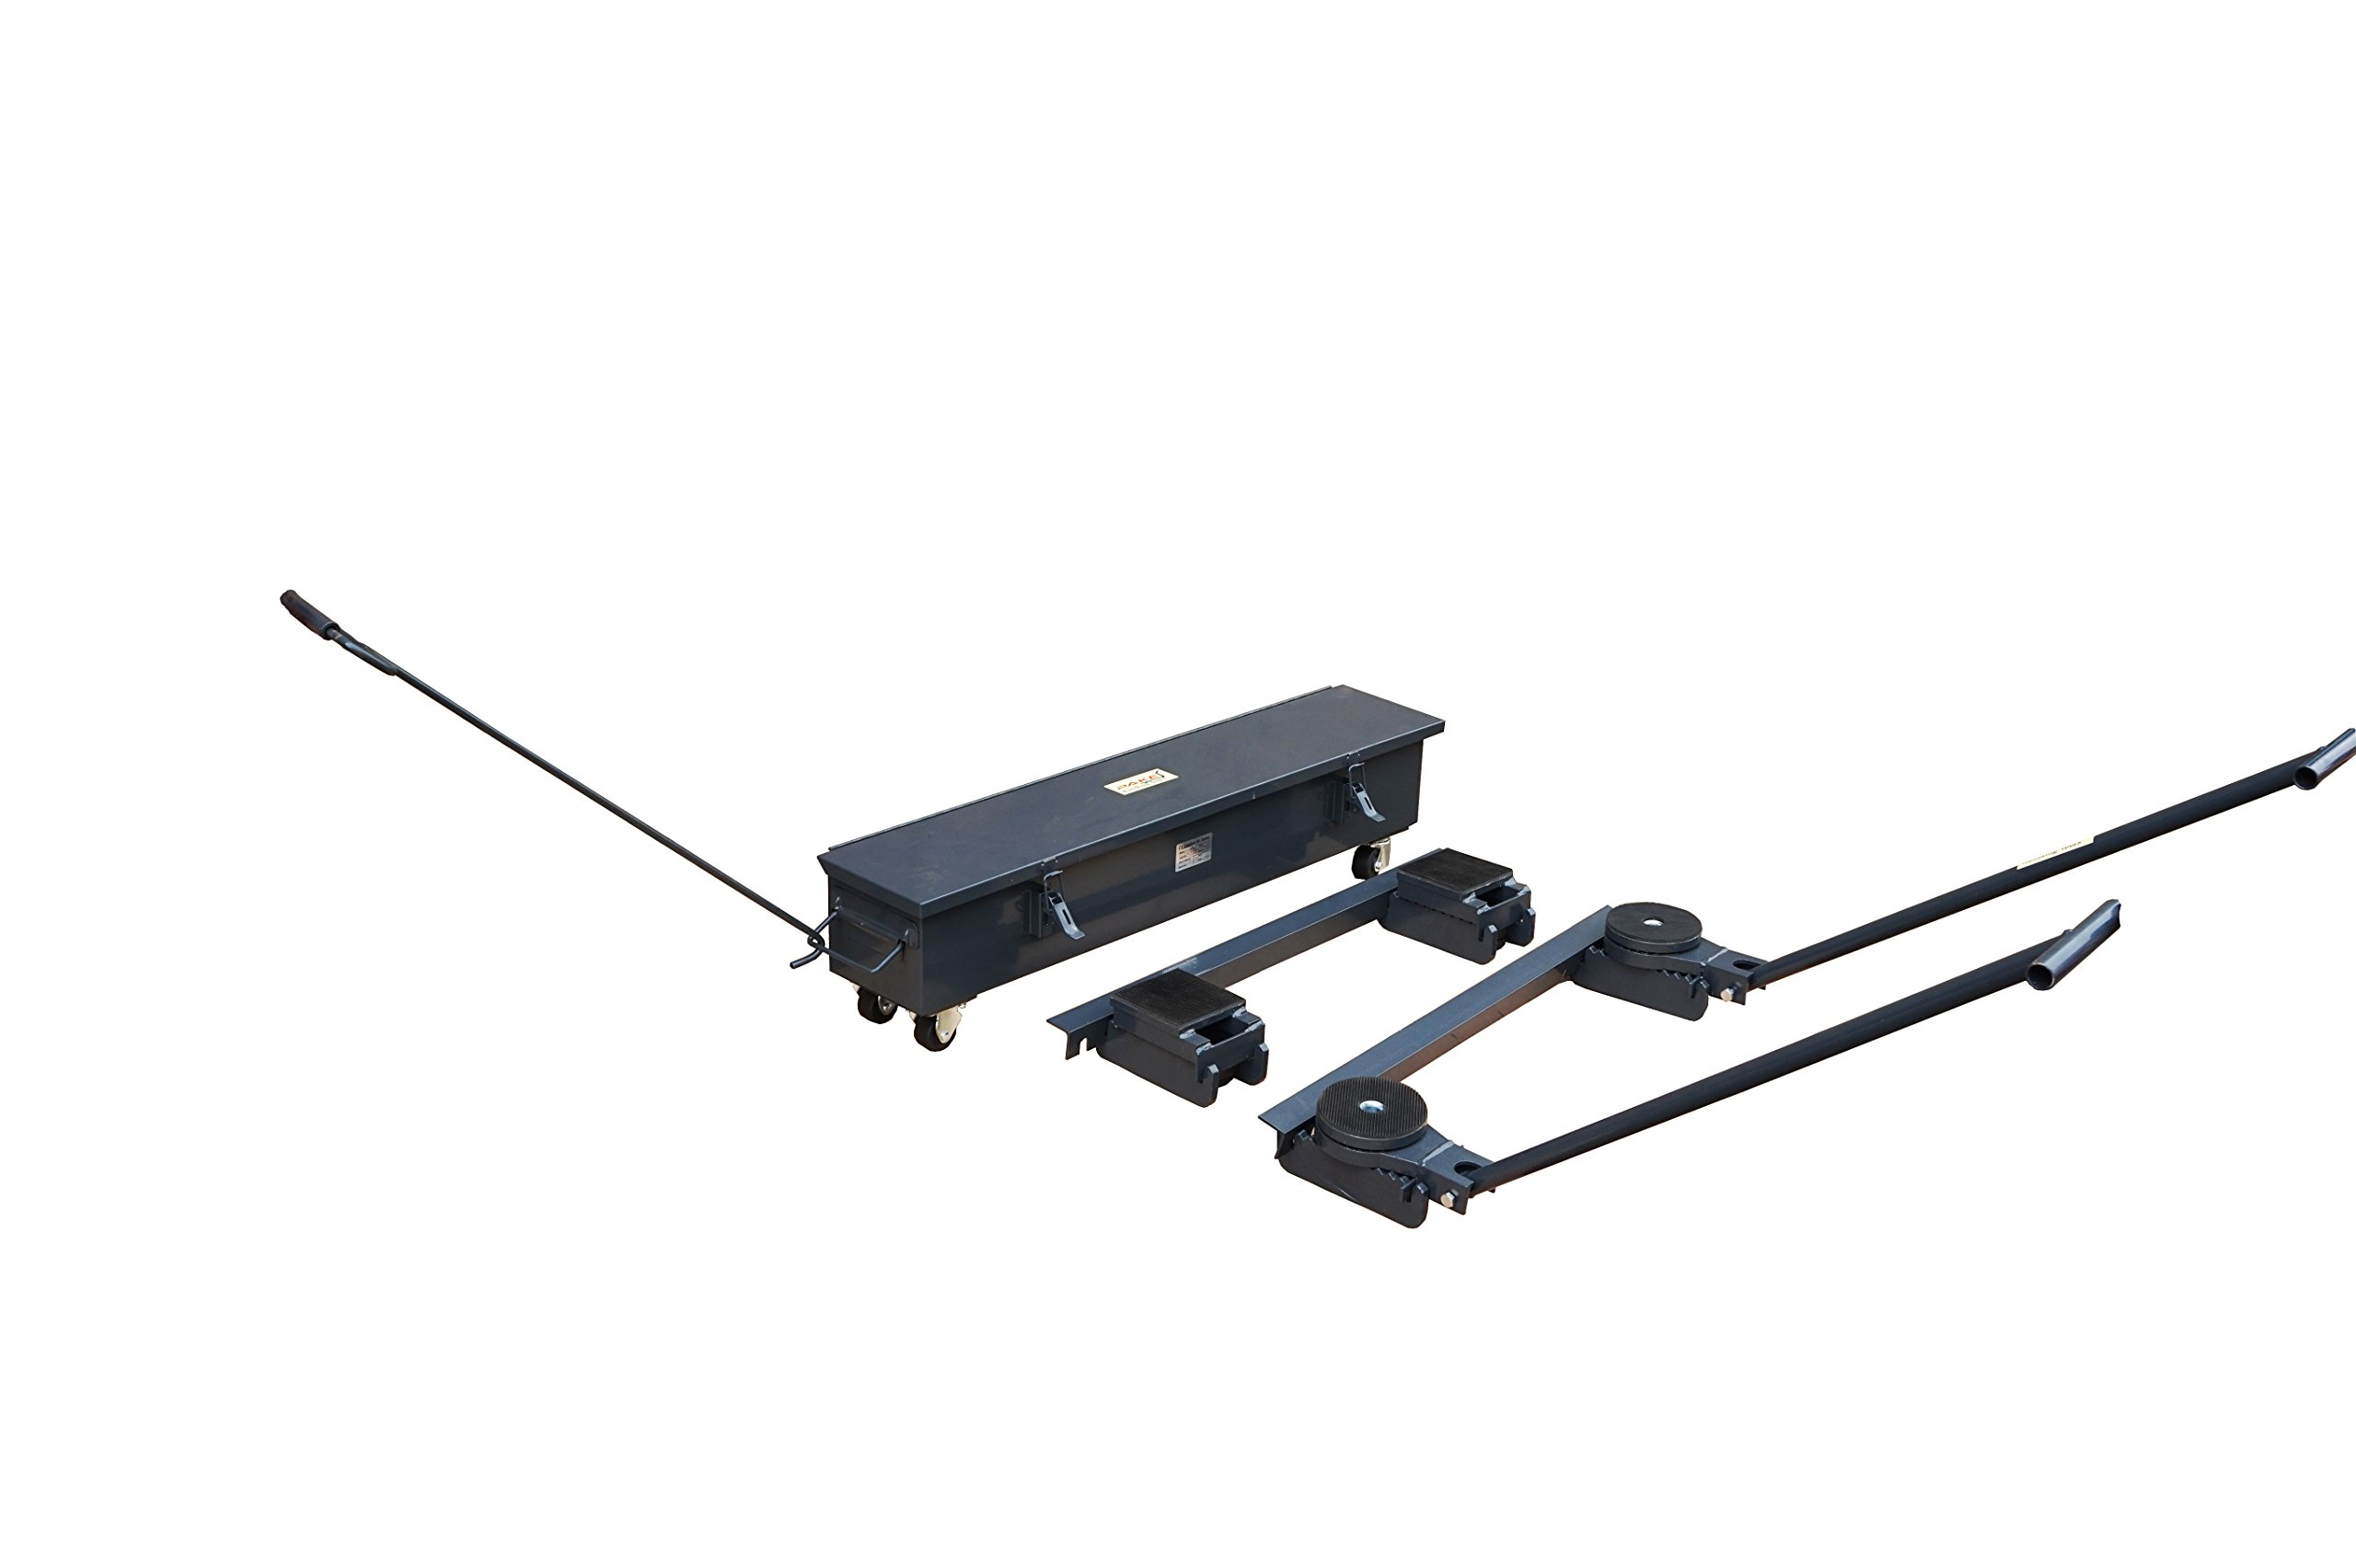 Pake Handling Tools - Equipment Roller Skate Kit, 44000lbs